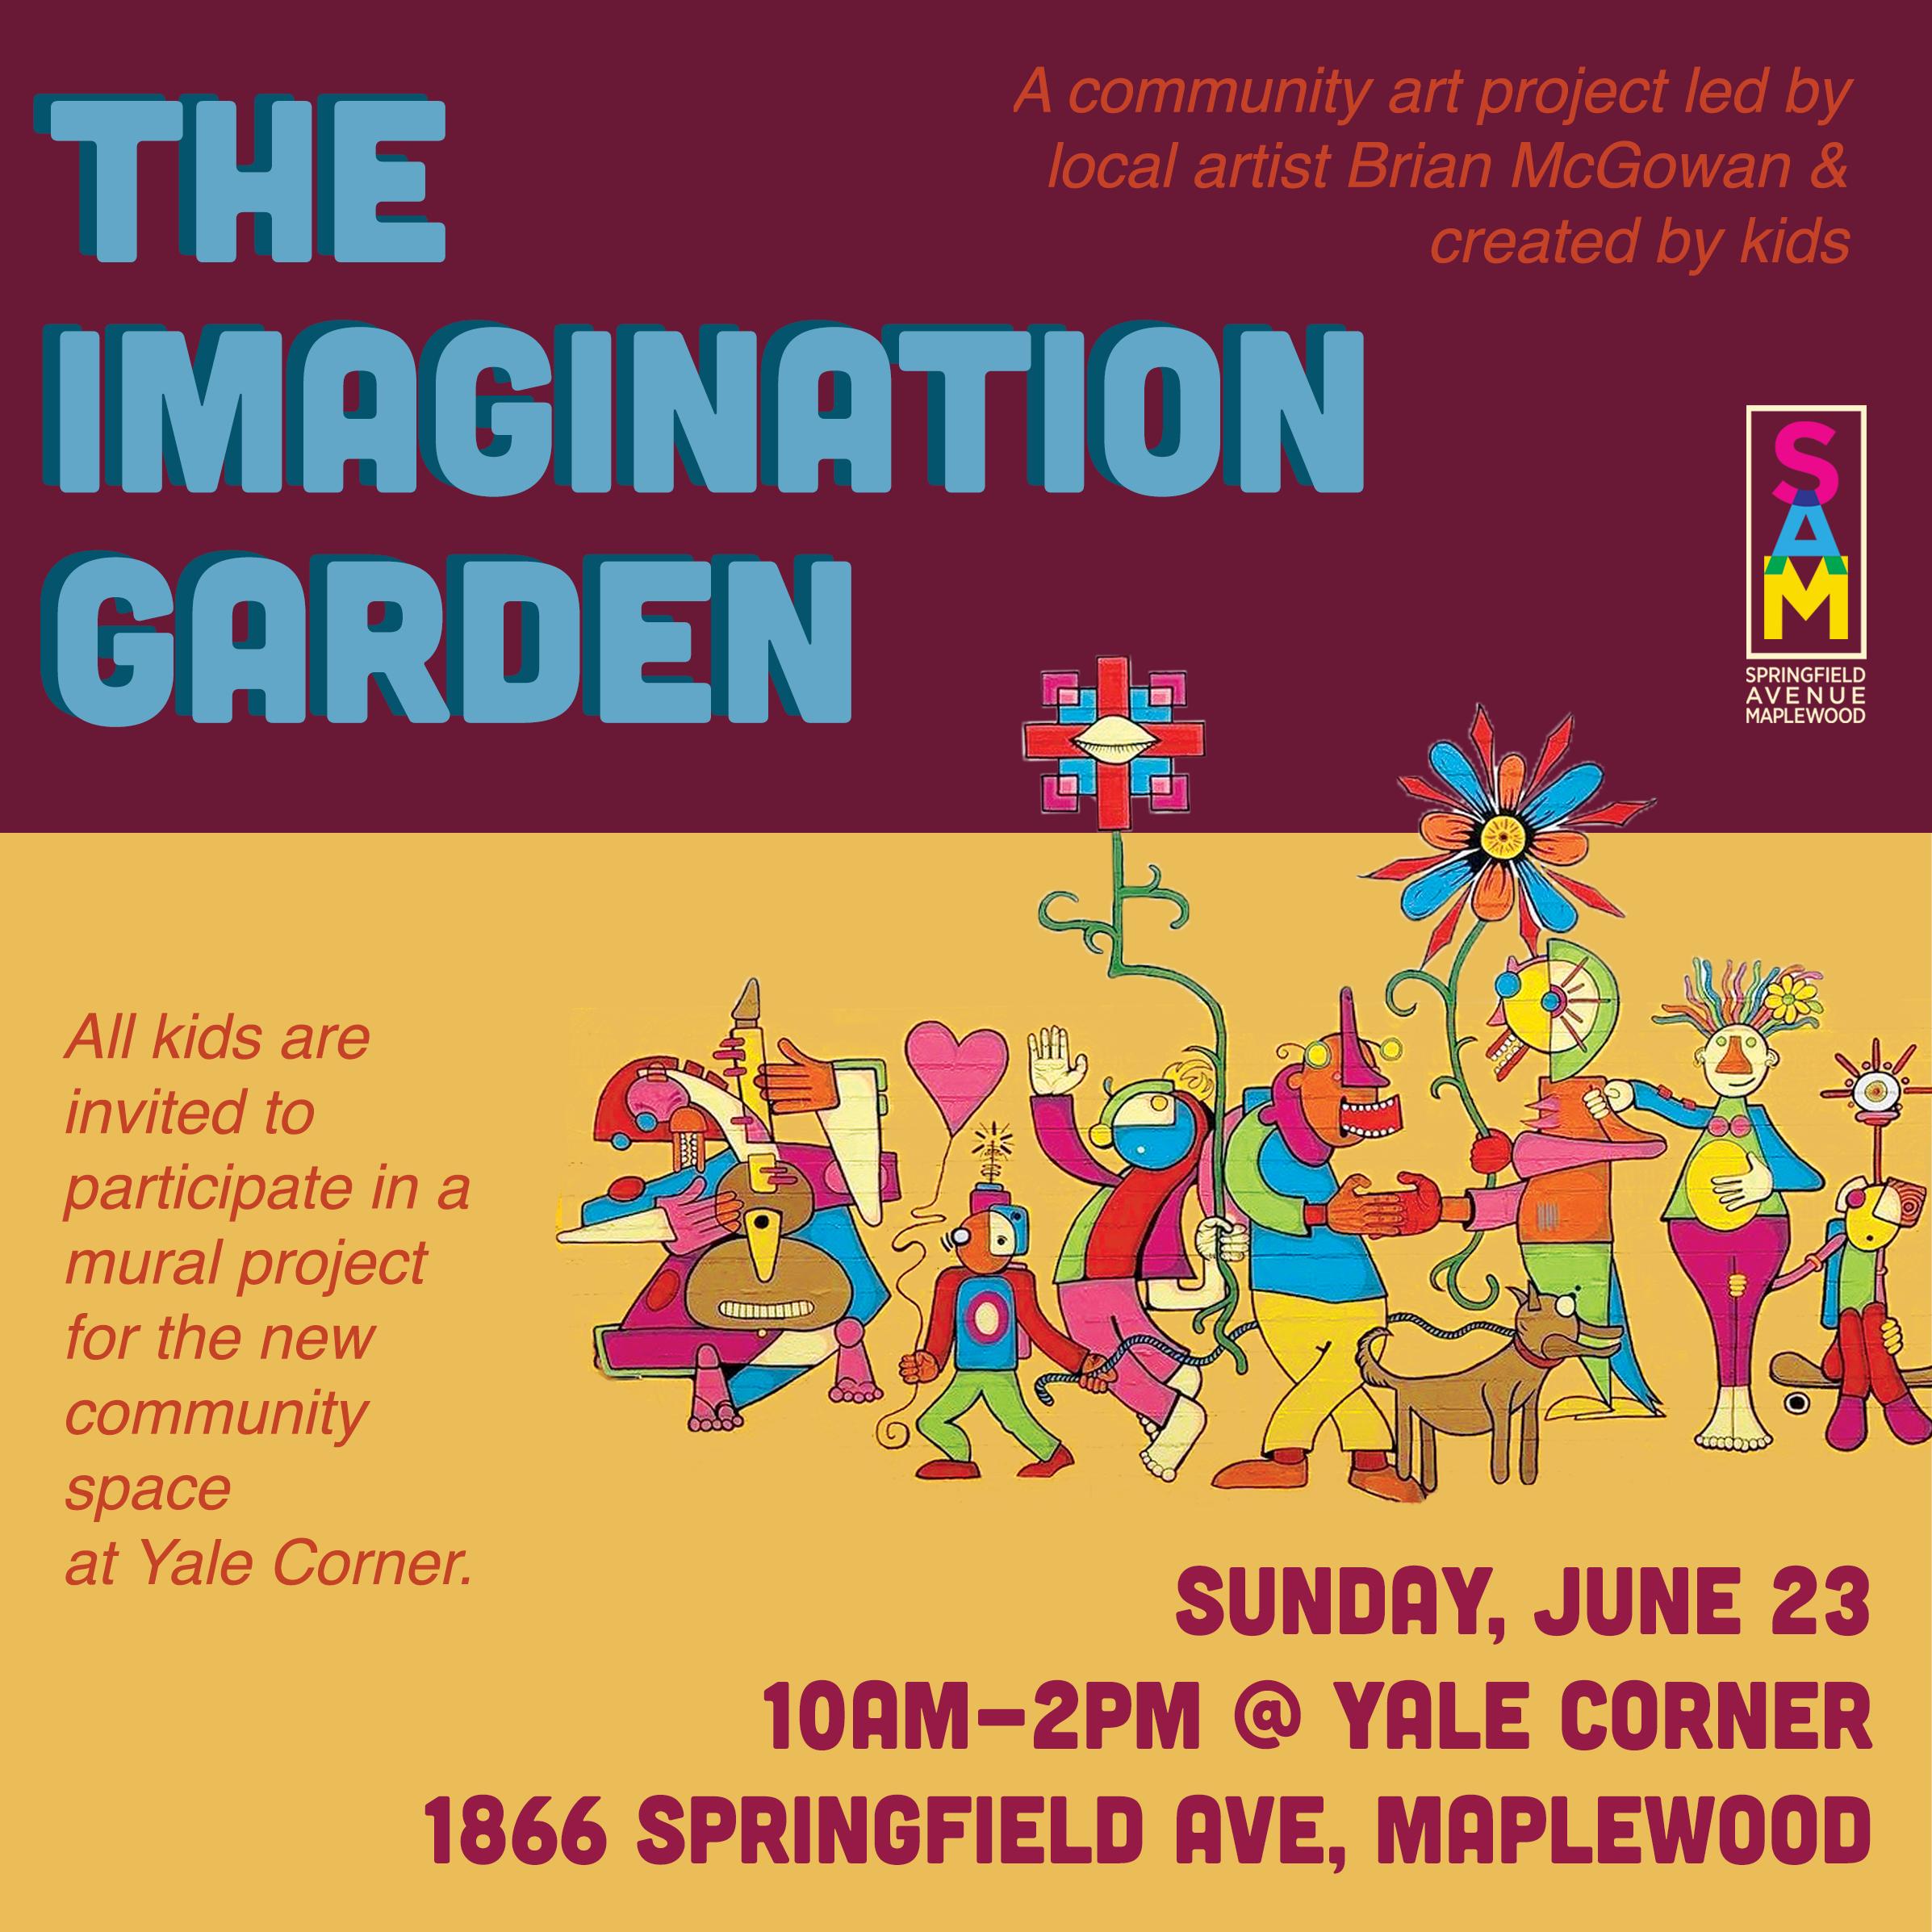 IG Imagination Garden.png